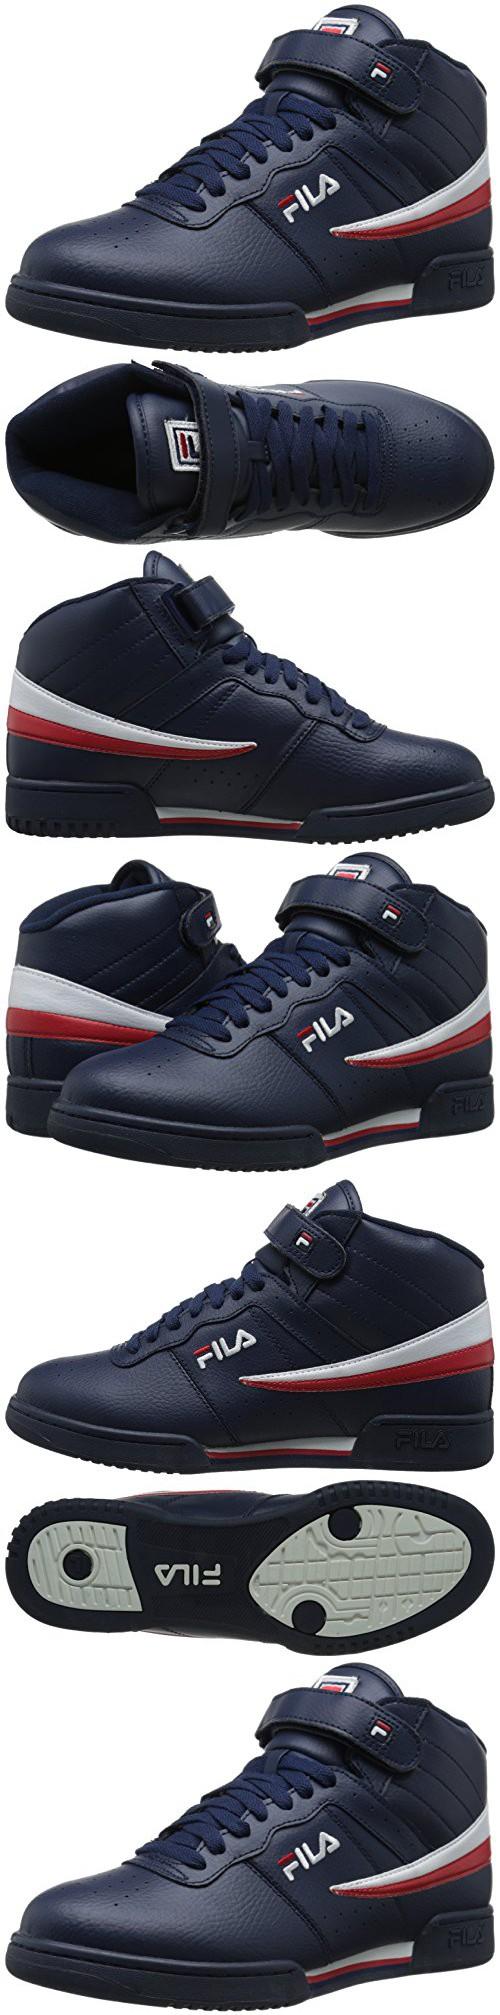 Fila Men's F 13V LeaSyn Fashion Sneakers, NavyWhiteFila